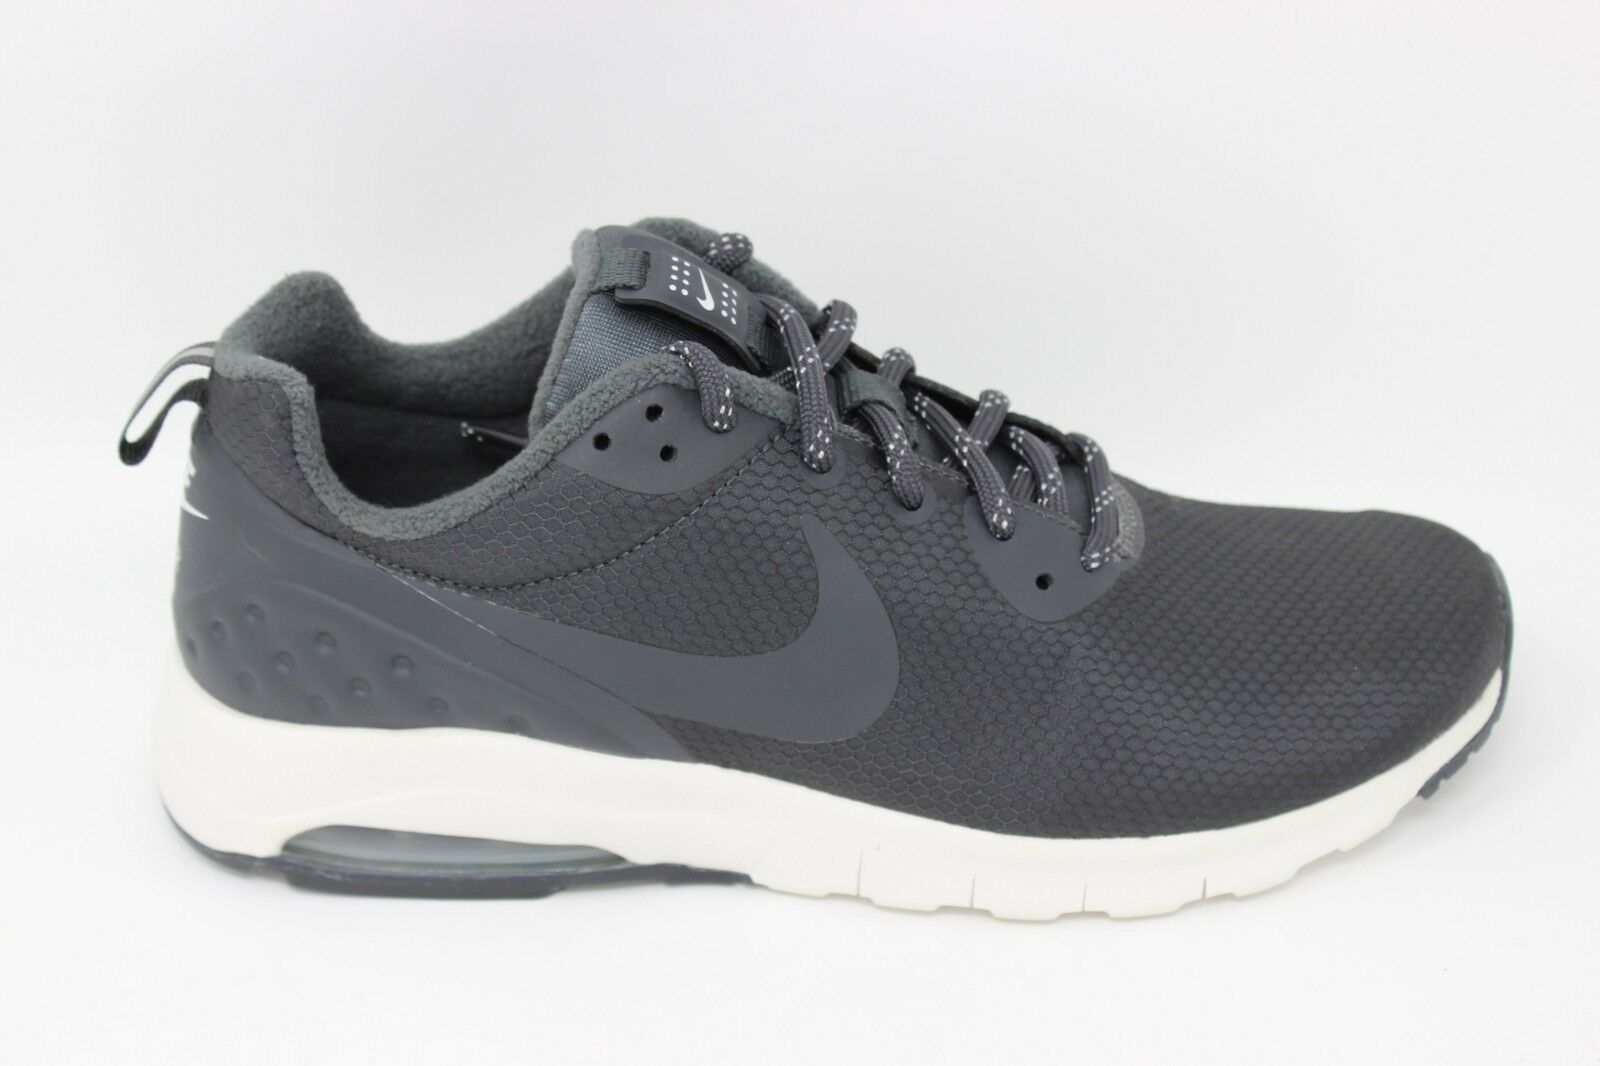 Nike air max uomini proposta sb / se 844836 002 antracite / sb phantom nuovo di zecca b28597